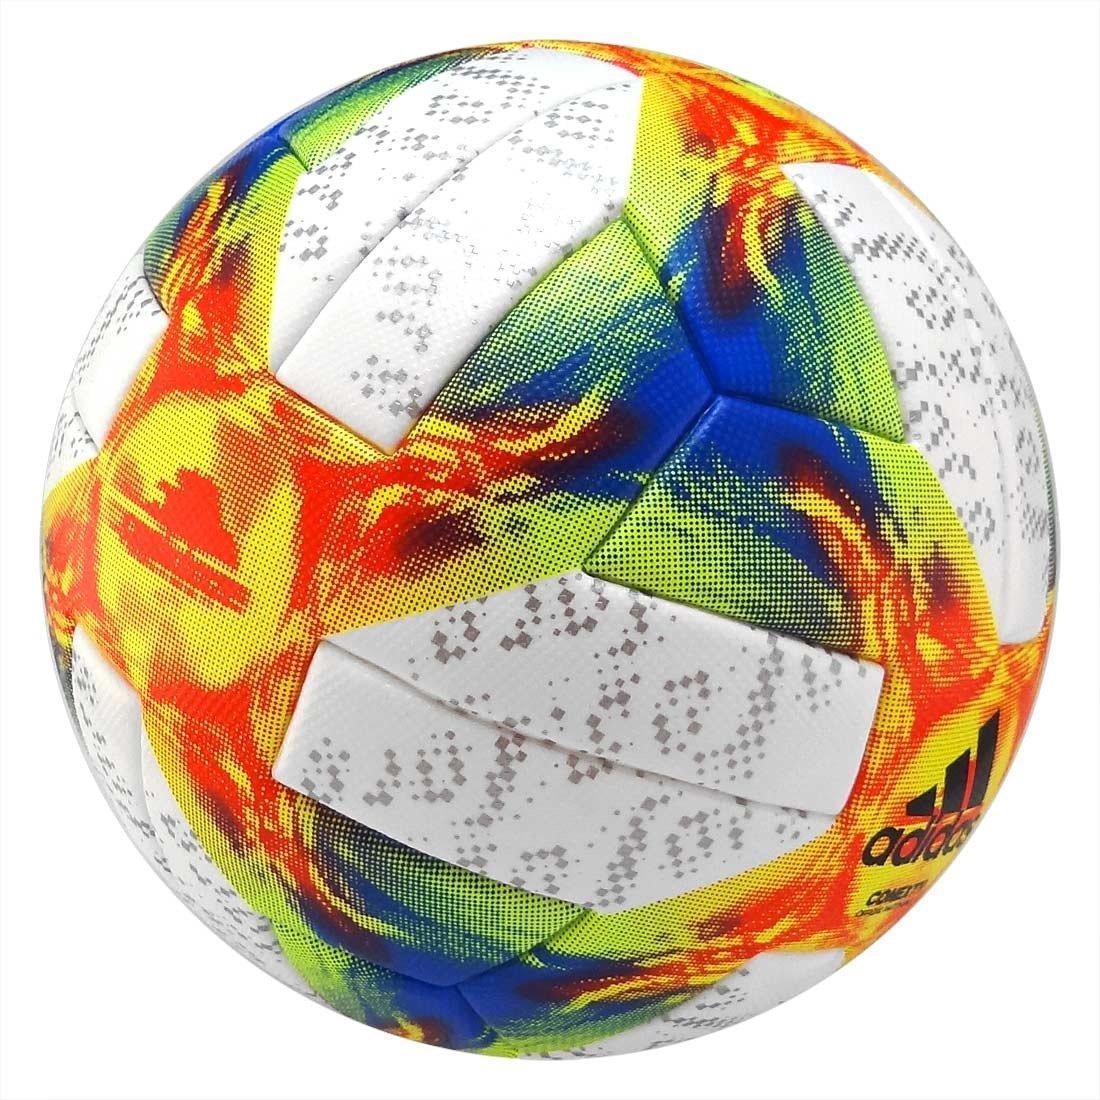 Мяч для футбола Adidas Conext 19 FIFA OMB